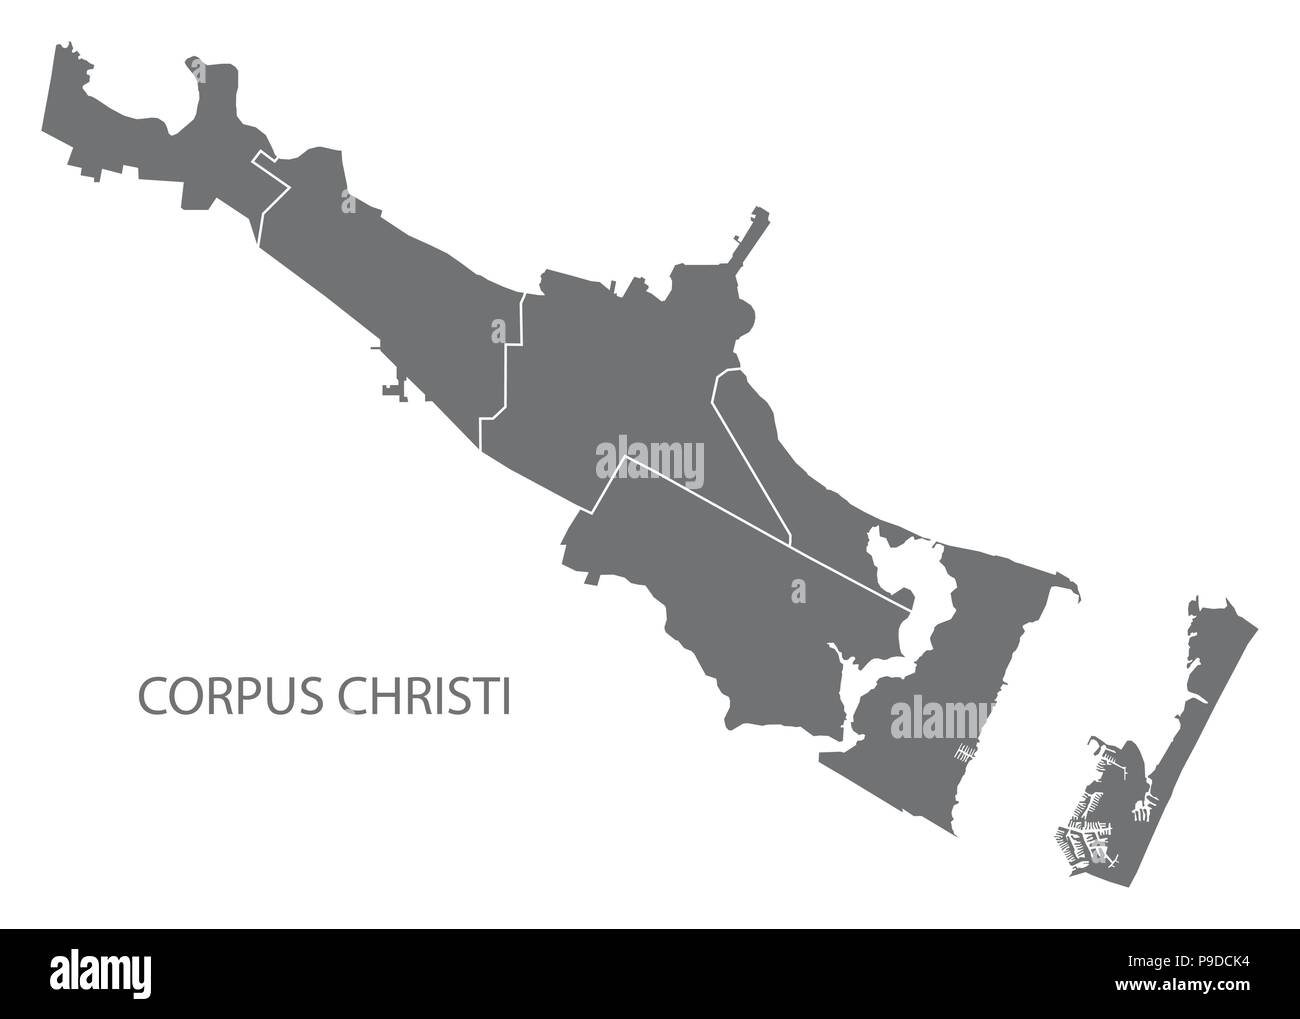 Corpus Christi Texas city map with neighborhoods grey illustration silhouette shape - Stock Vector